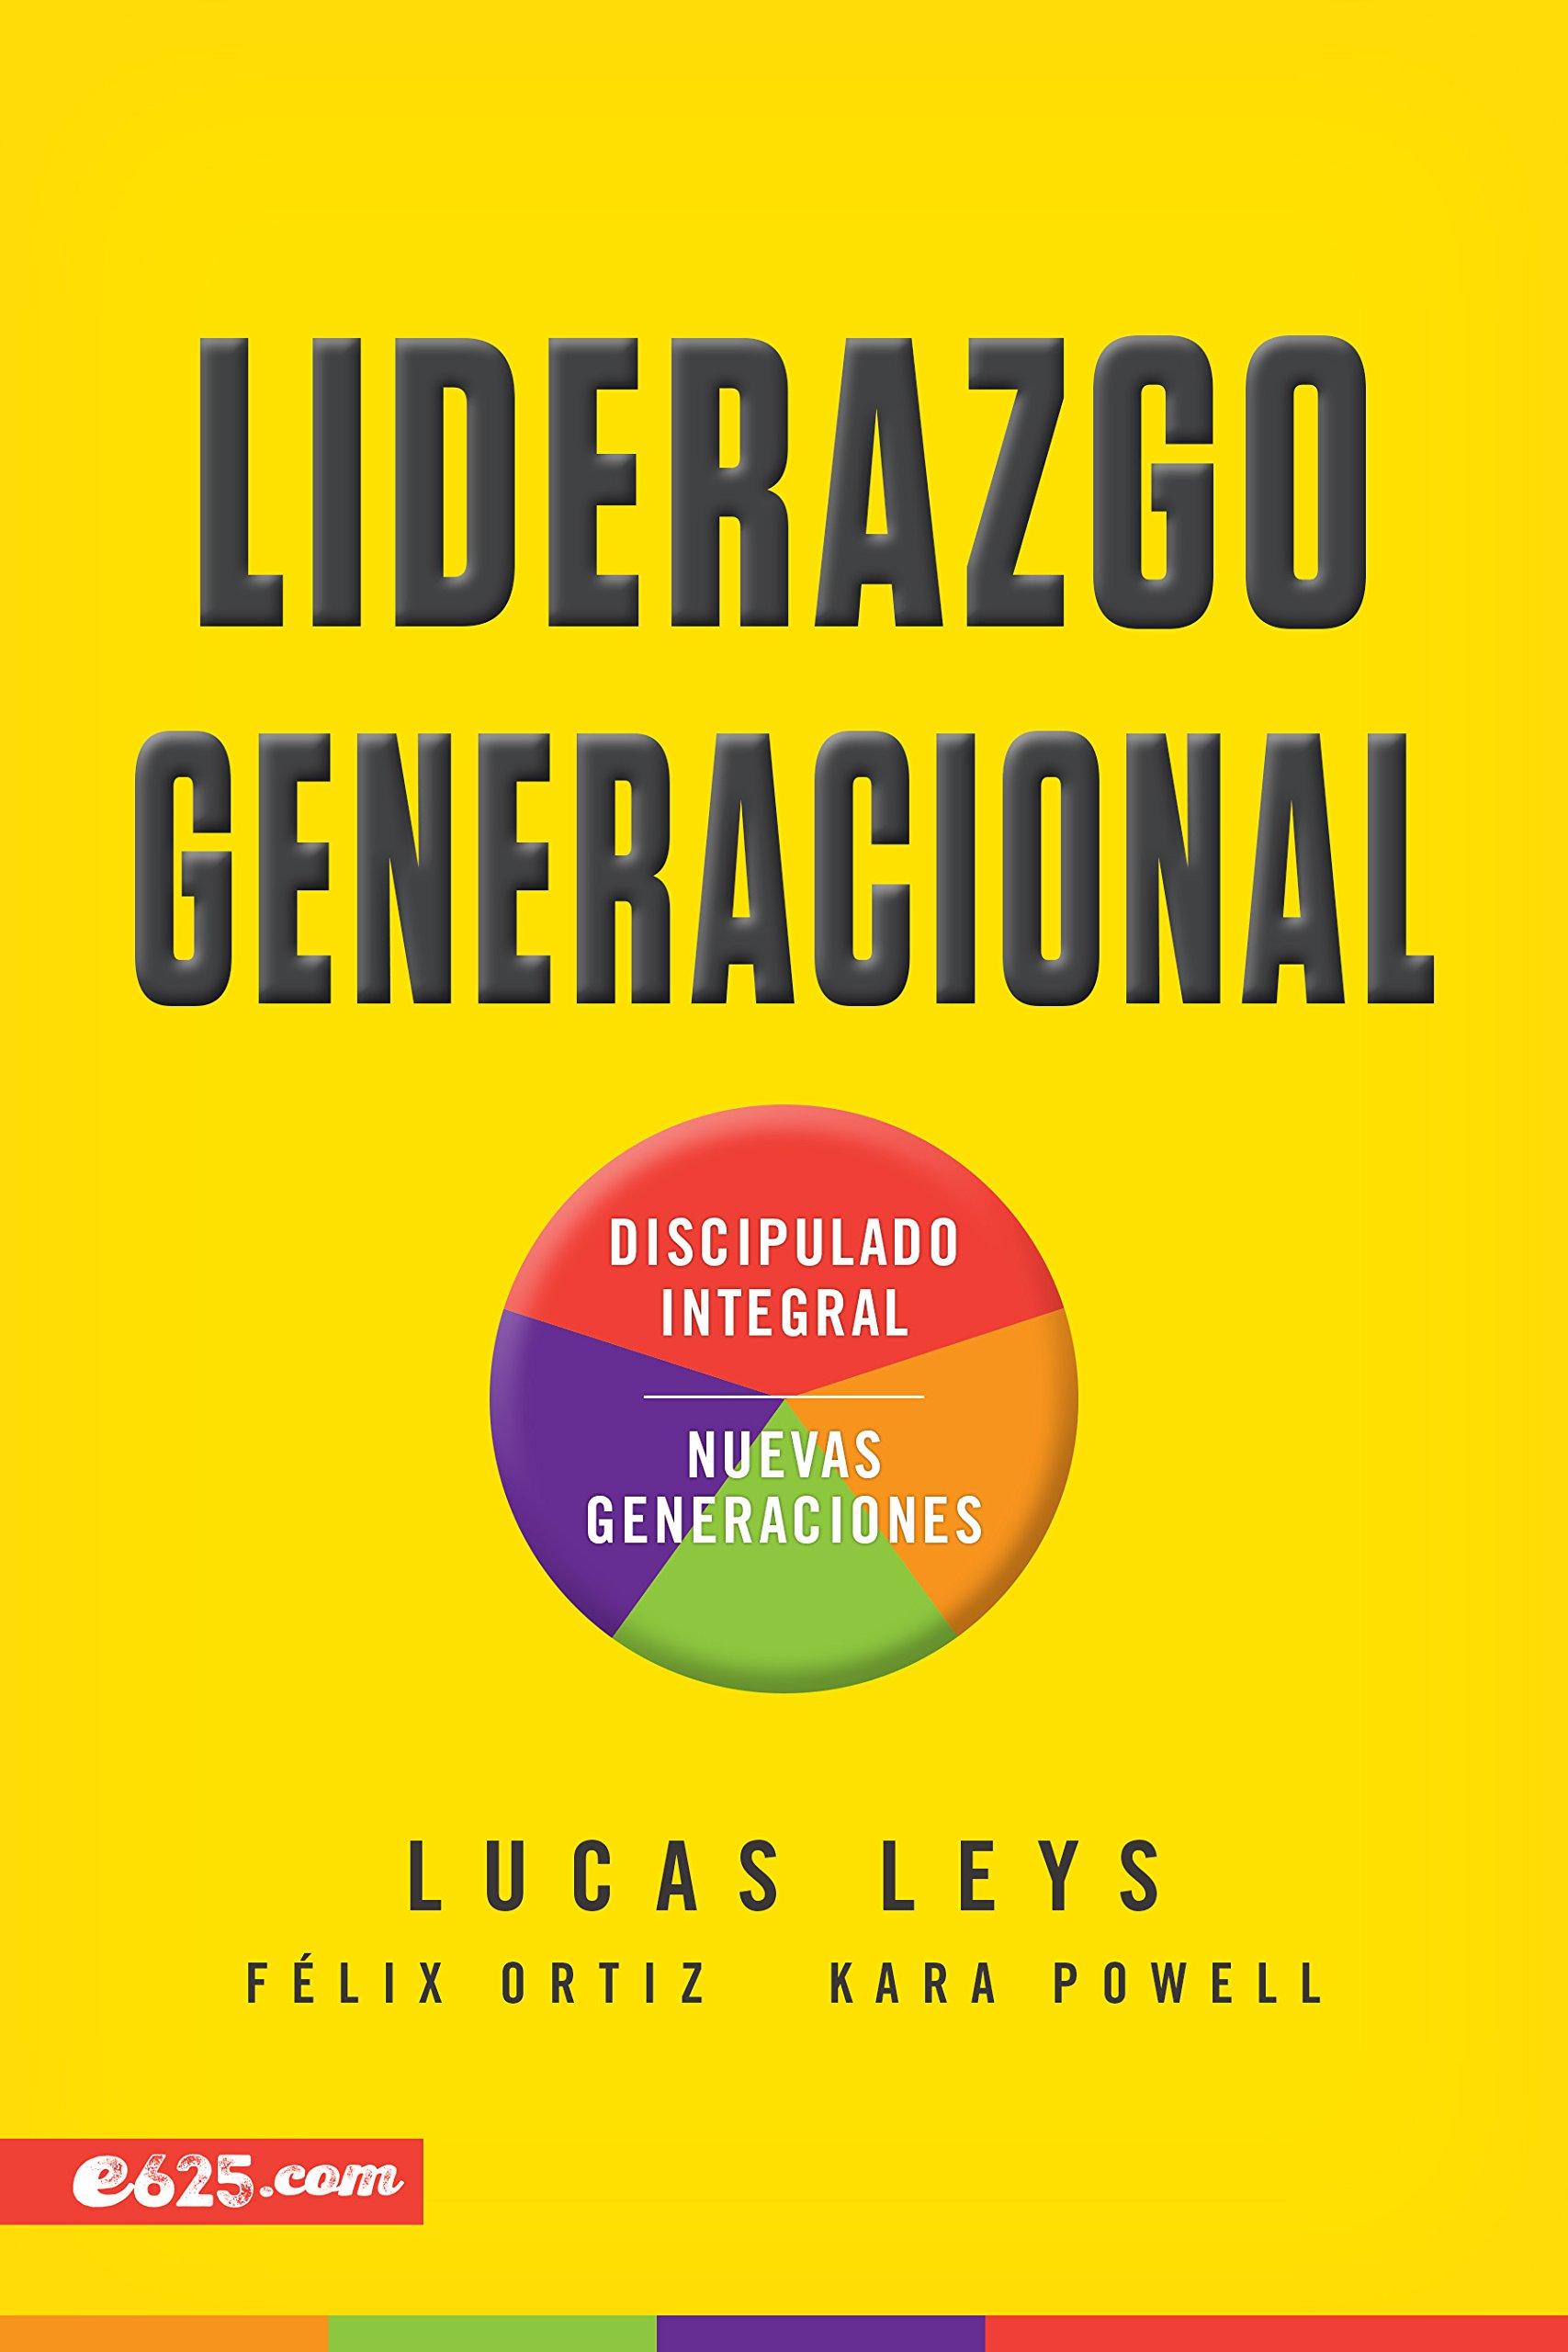 DESCARGAR LIBRO 101 PREGUNTAS DIFICILES LUCAS LEYS PDF @tataya.com.mx